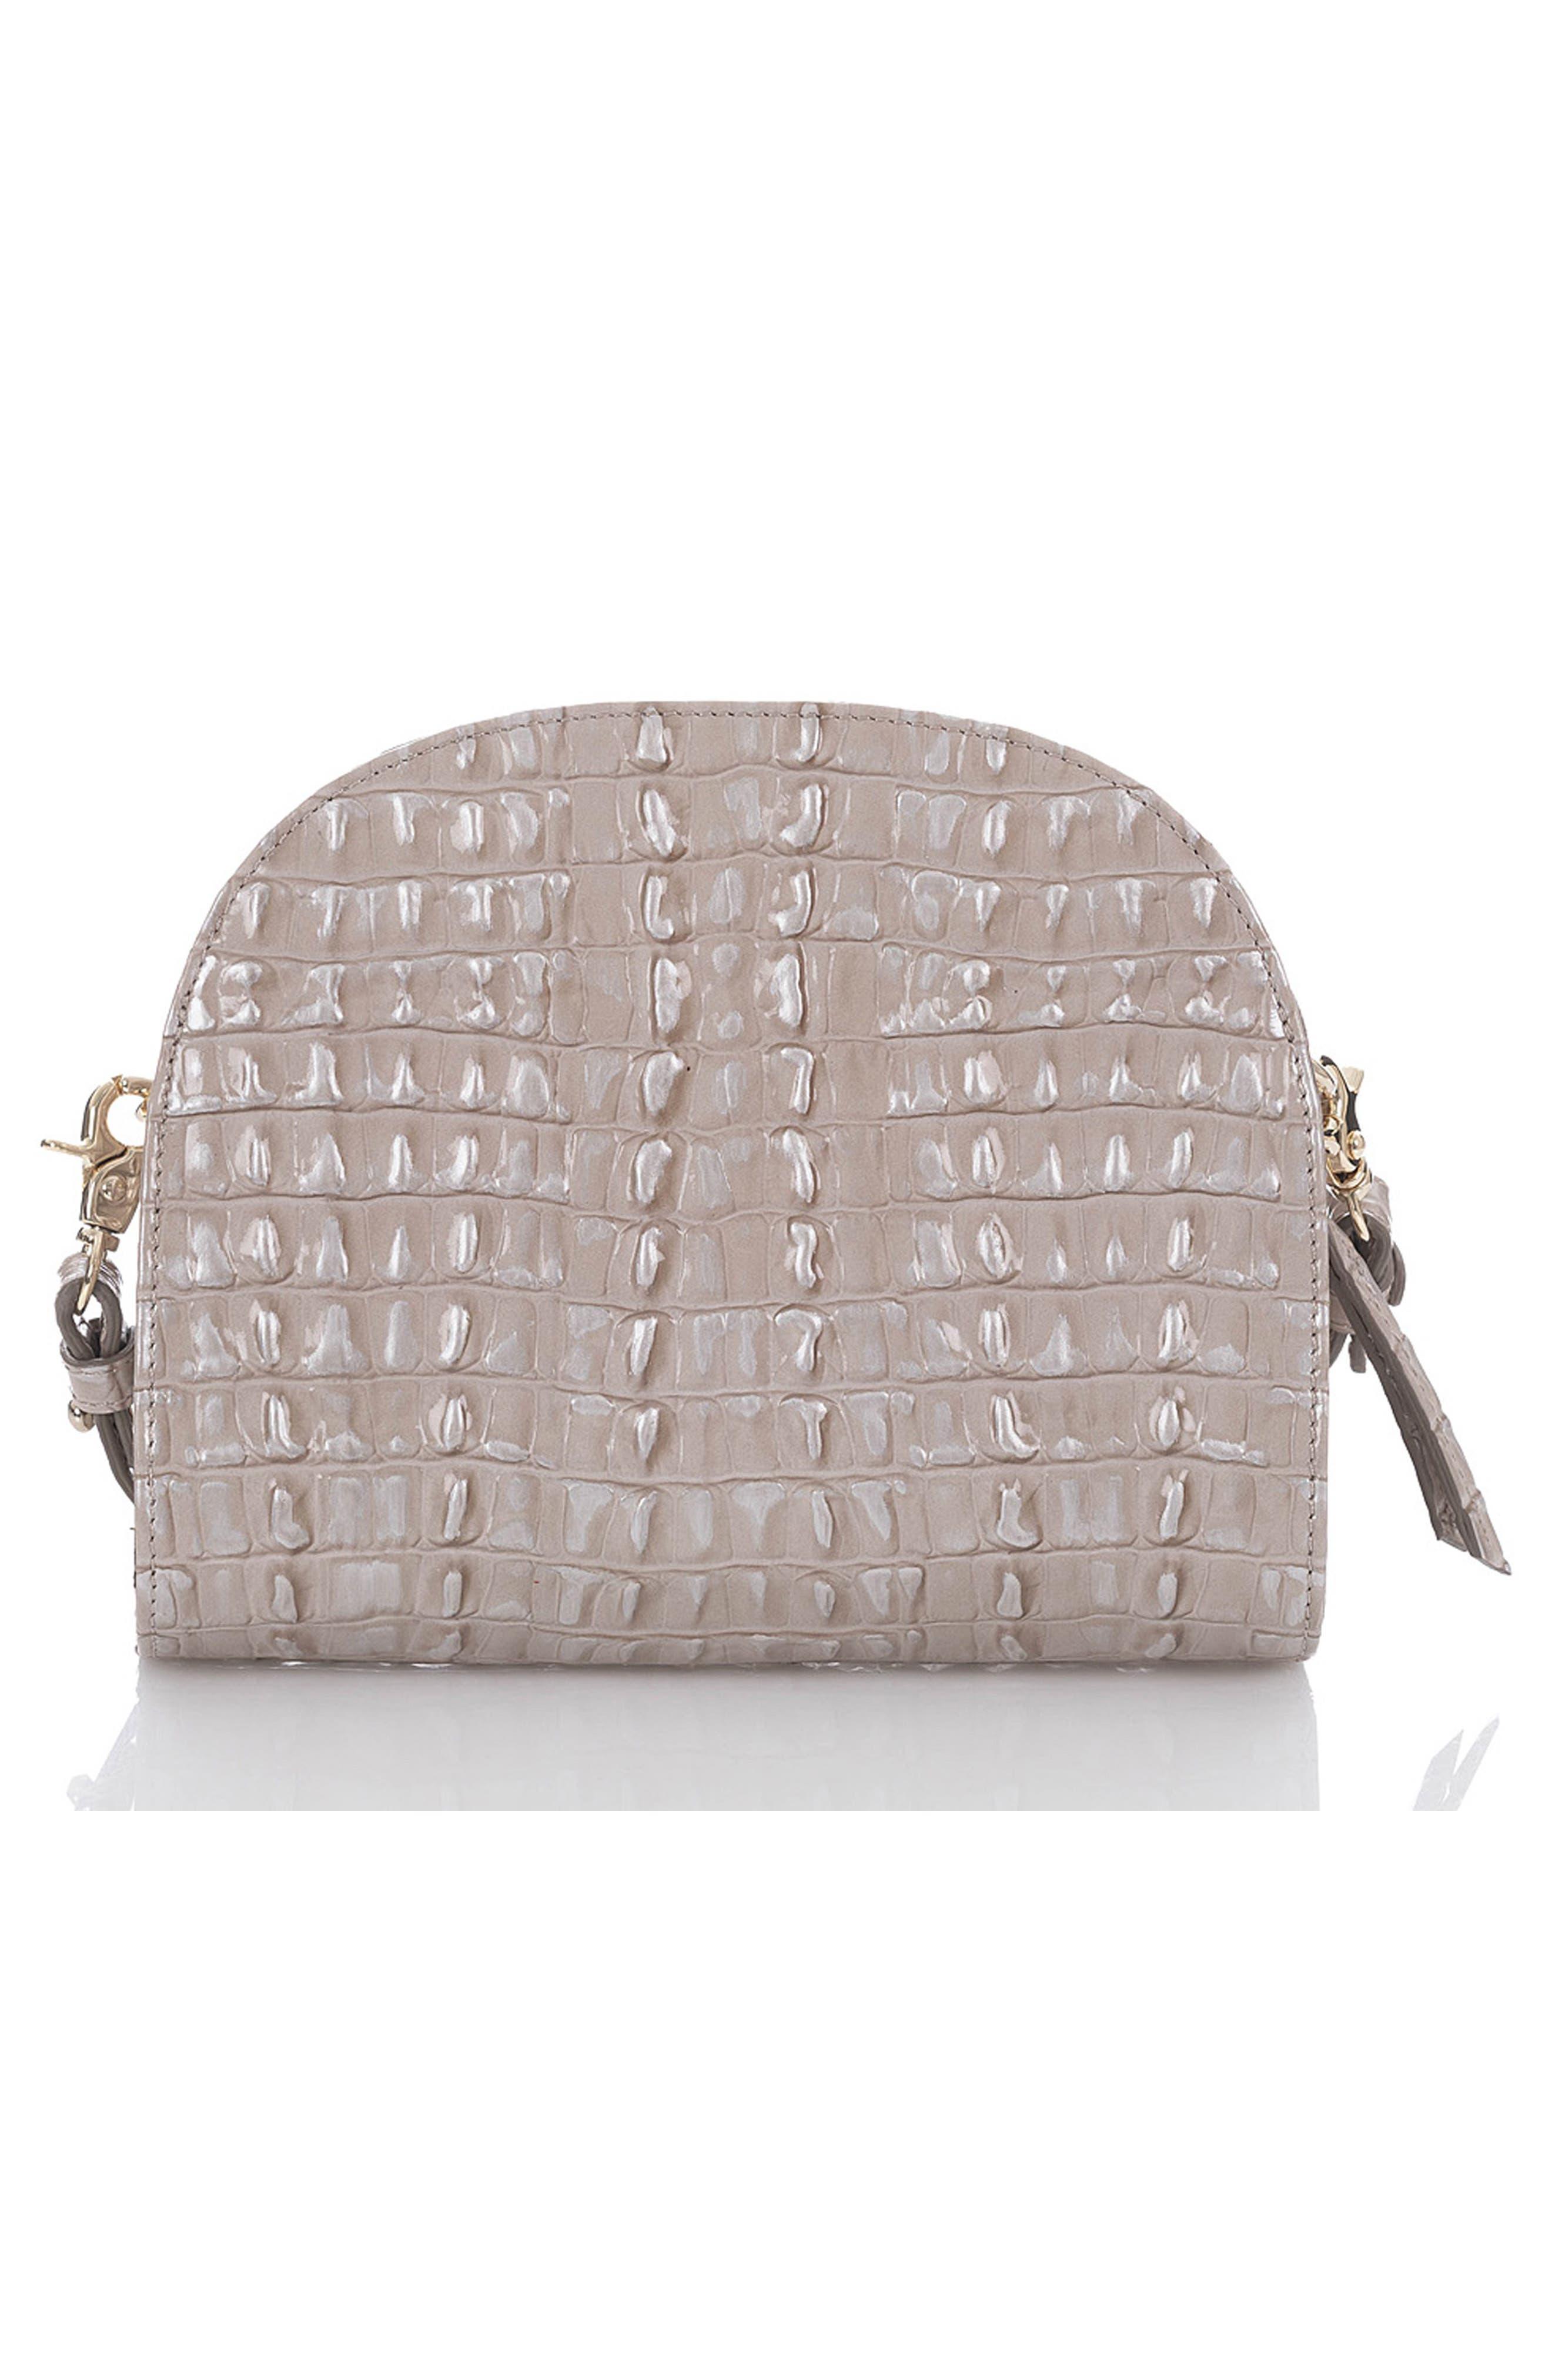 BRAHMIN, Leah Croc Embossed Leather Crossbody Bag, Alternate thumbnail 2, color, 020